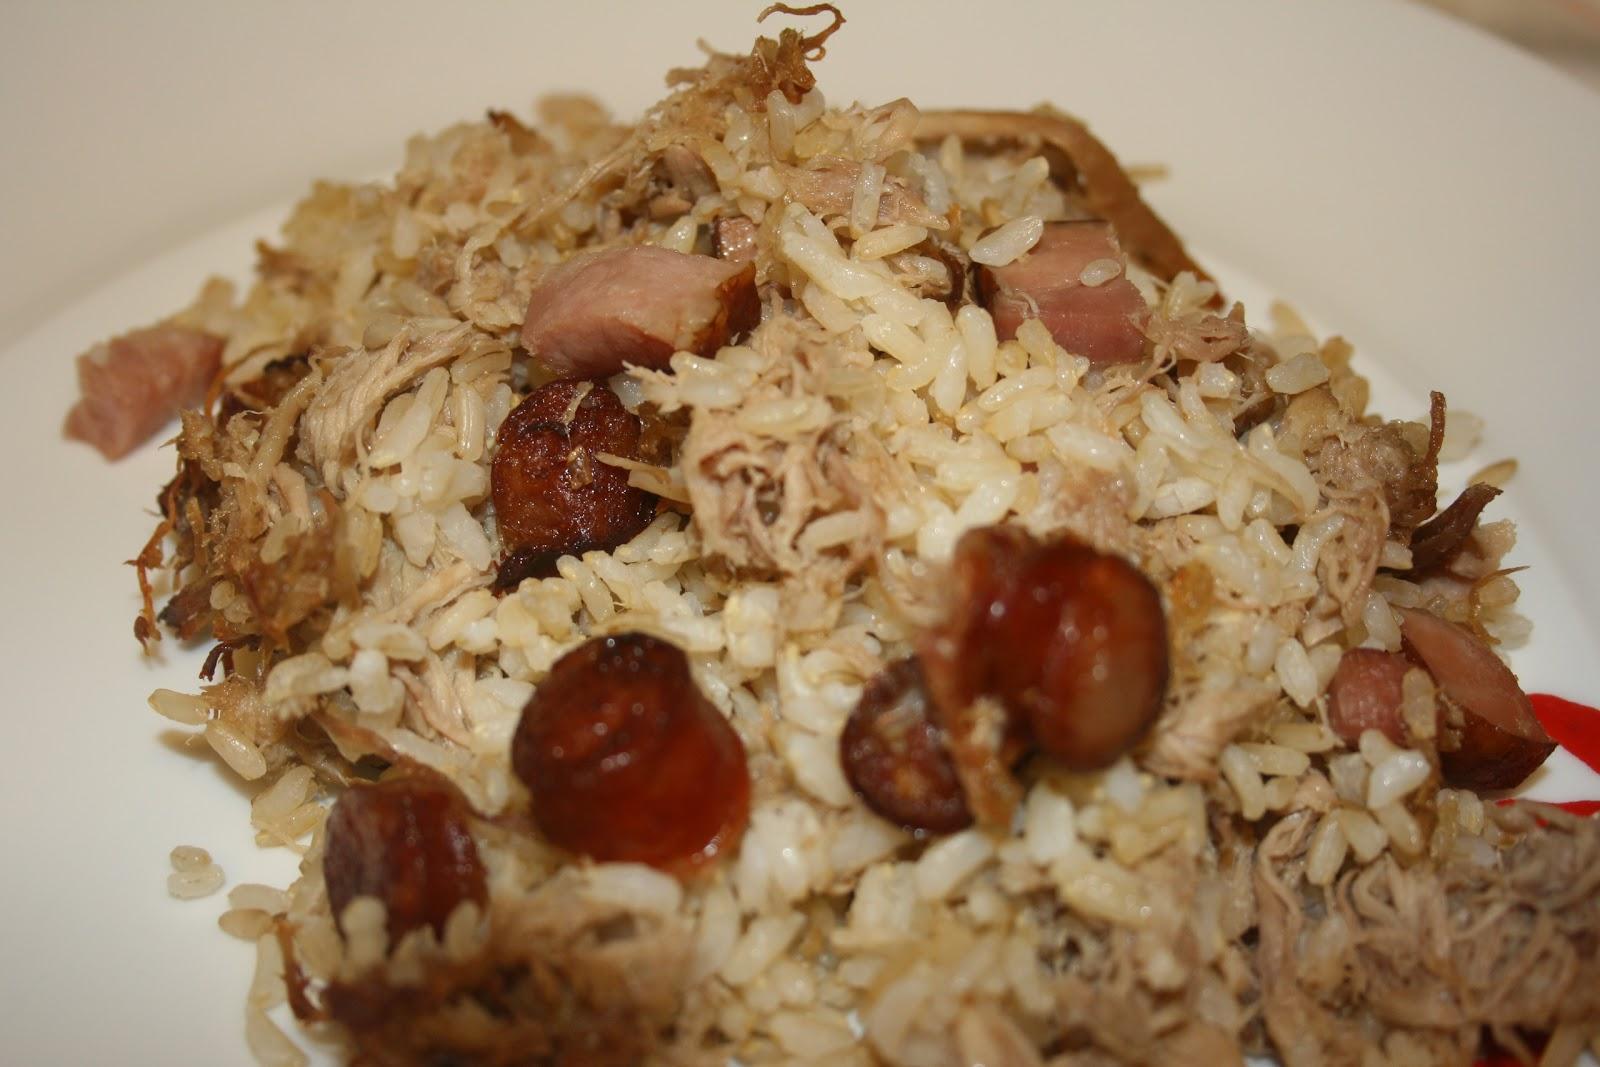 arroz abanda arroz con pollo arroz tapado arroz con pollo arroz